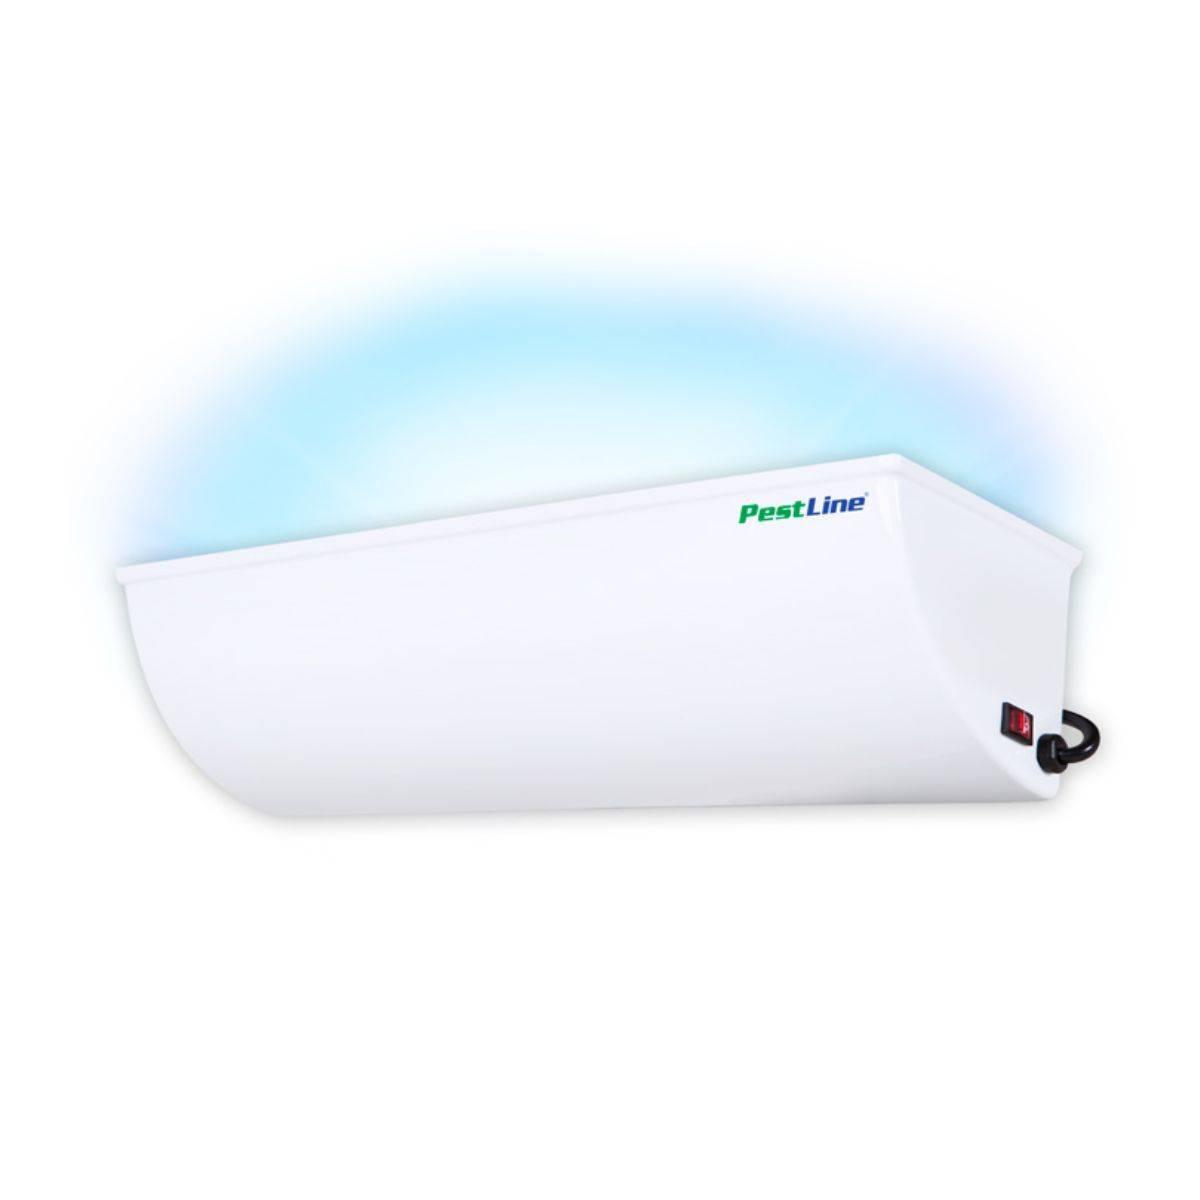 Armadilha Luminosa Adesiva para Insetos Arandela Bivolt PA-1